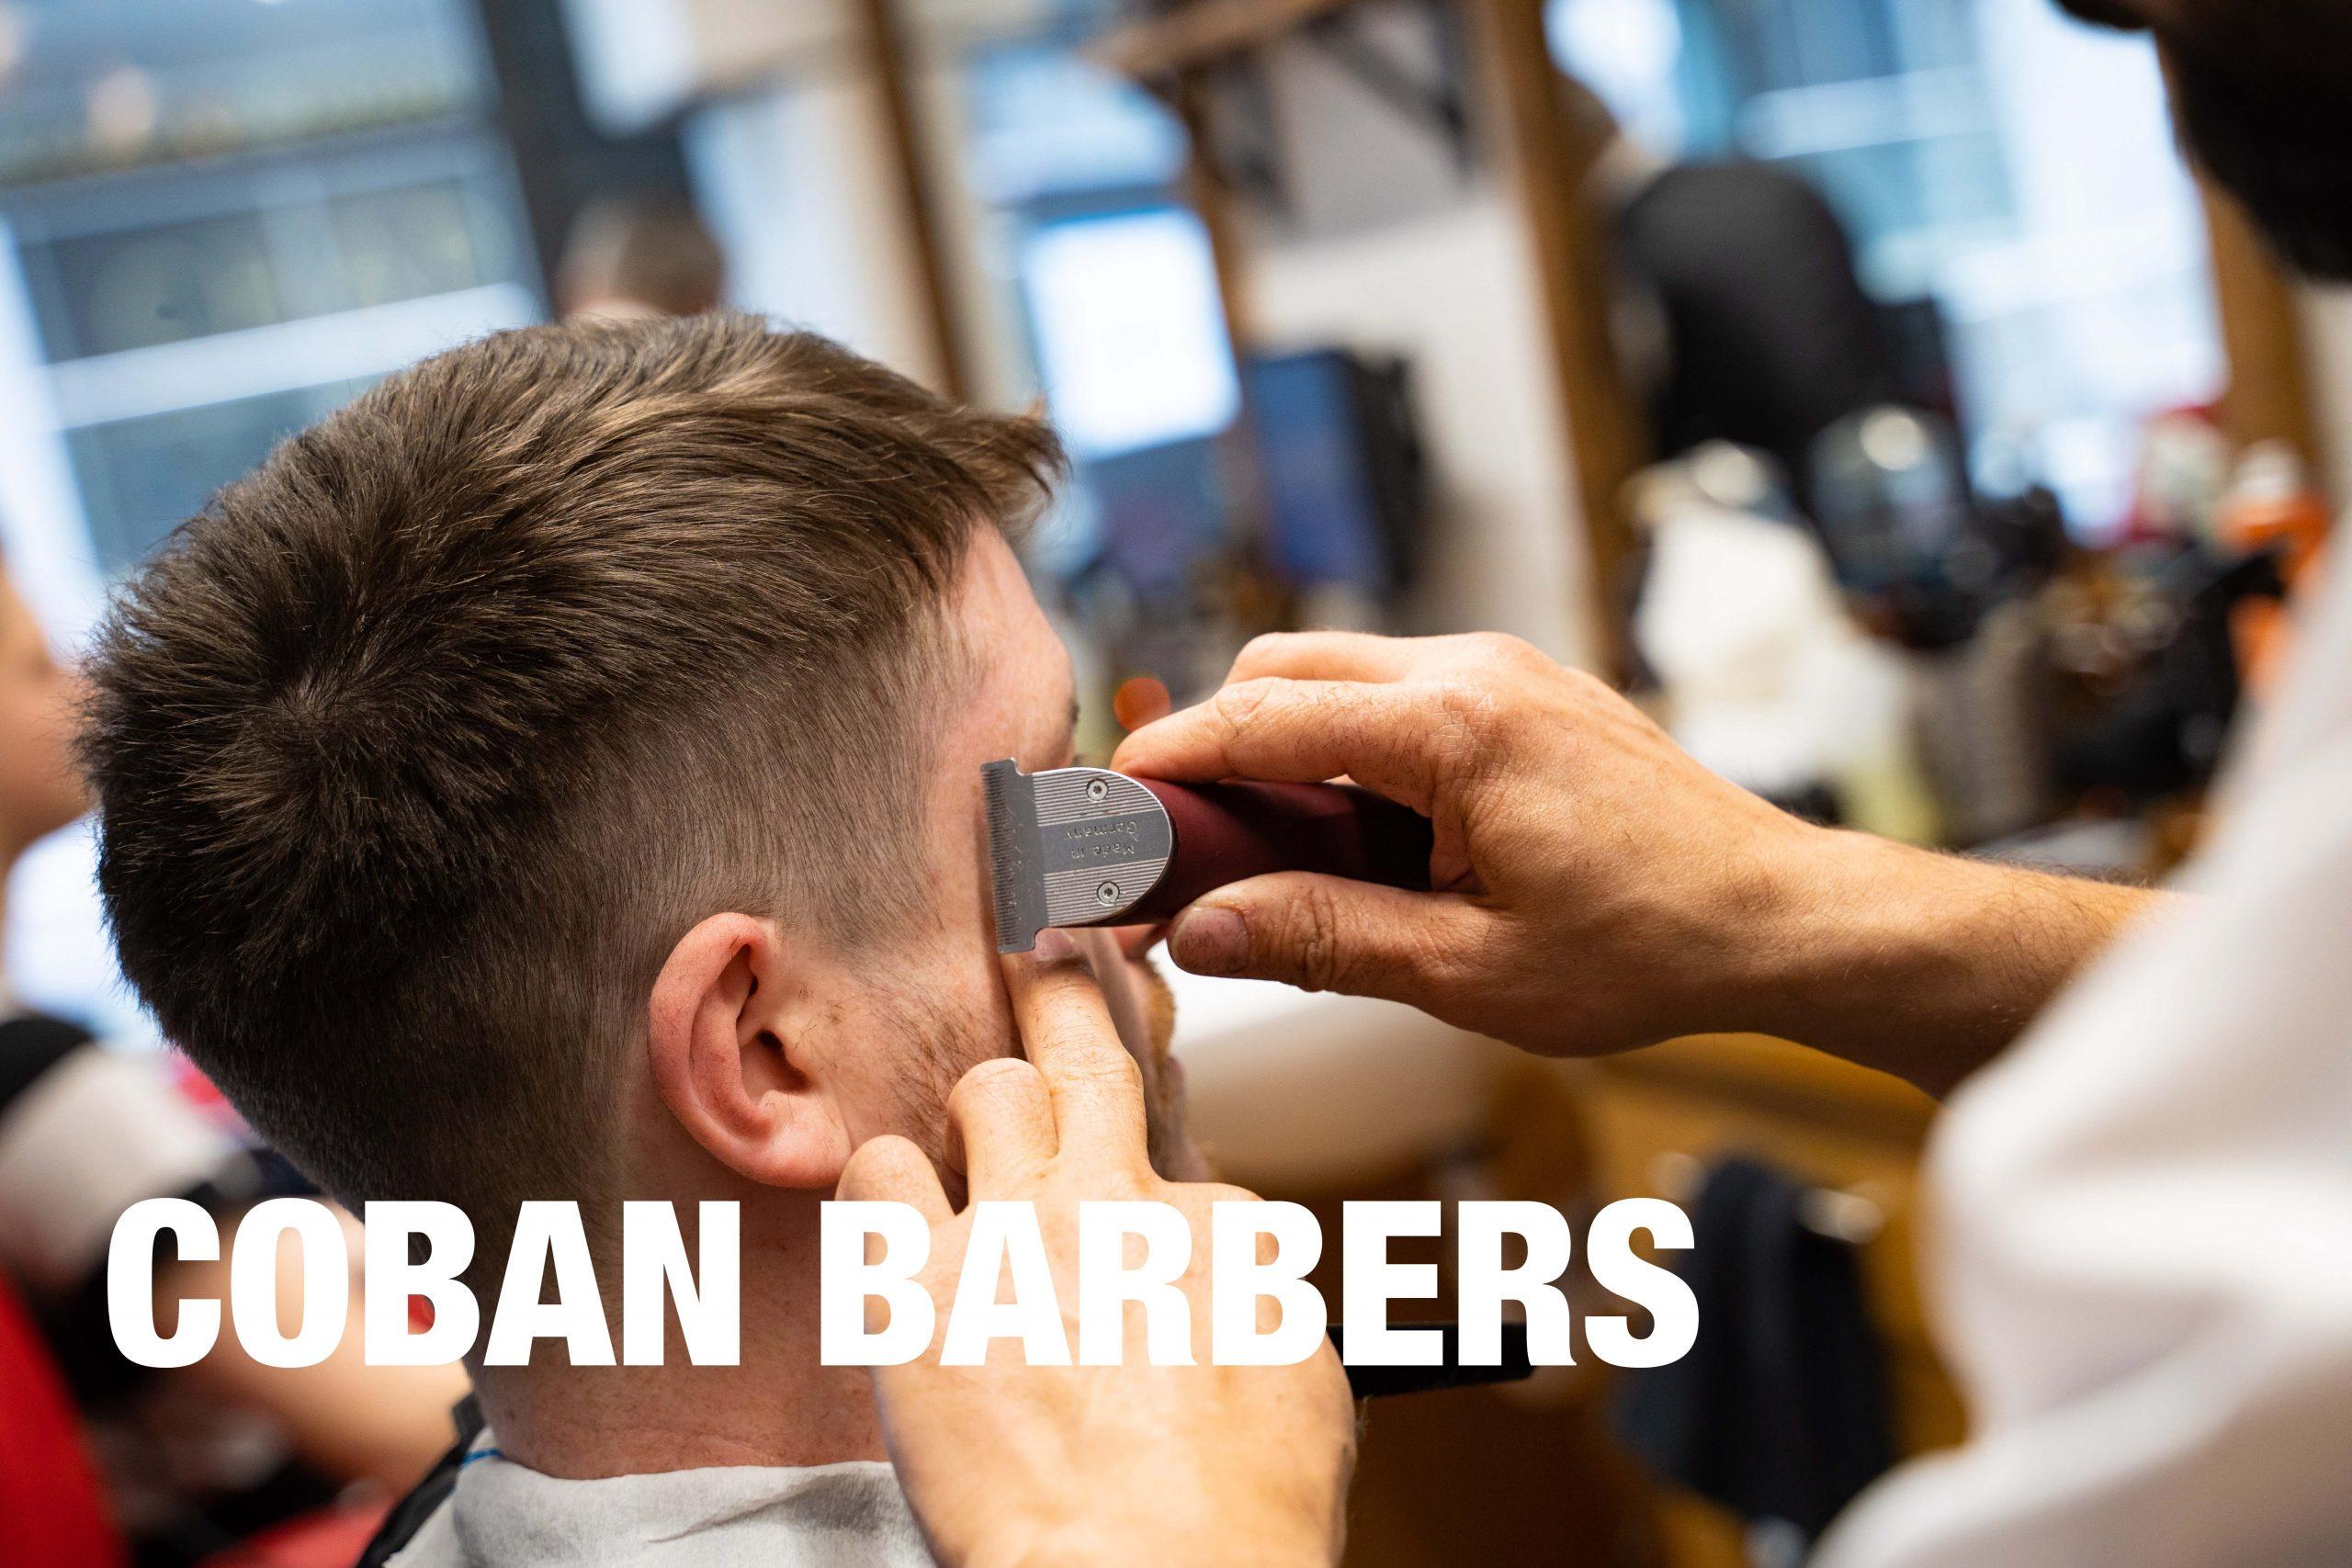 COBAN BARBERS – Turkish Barbershop in London